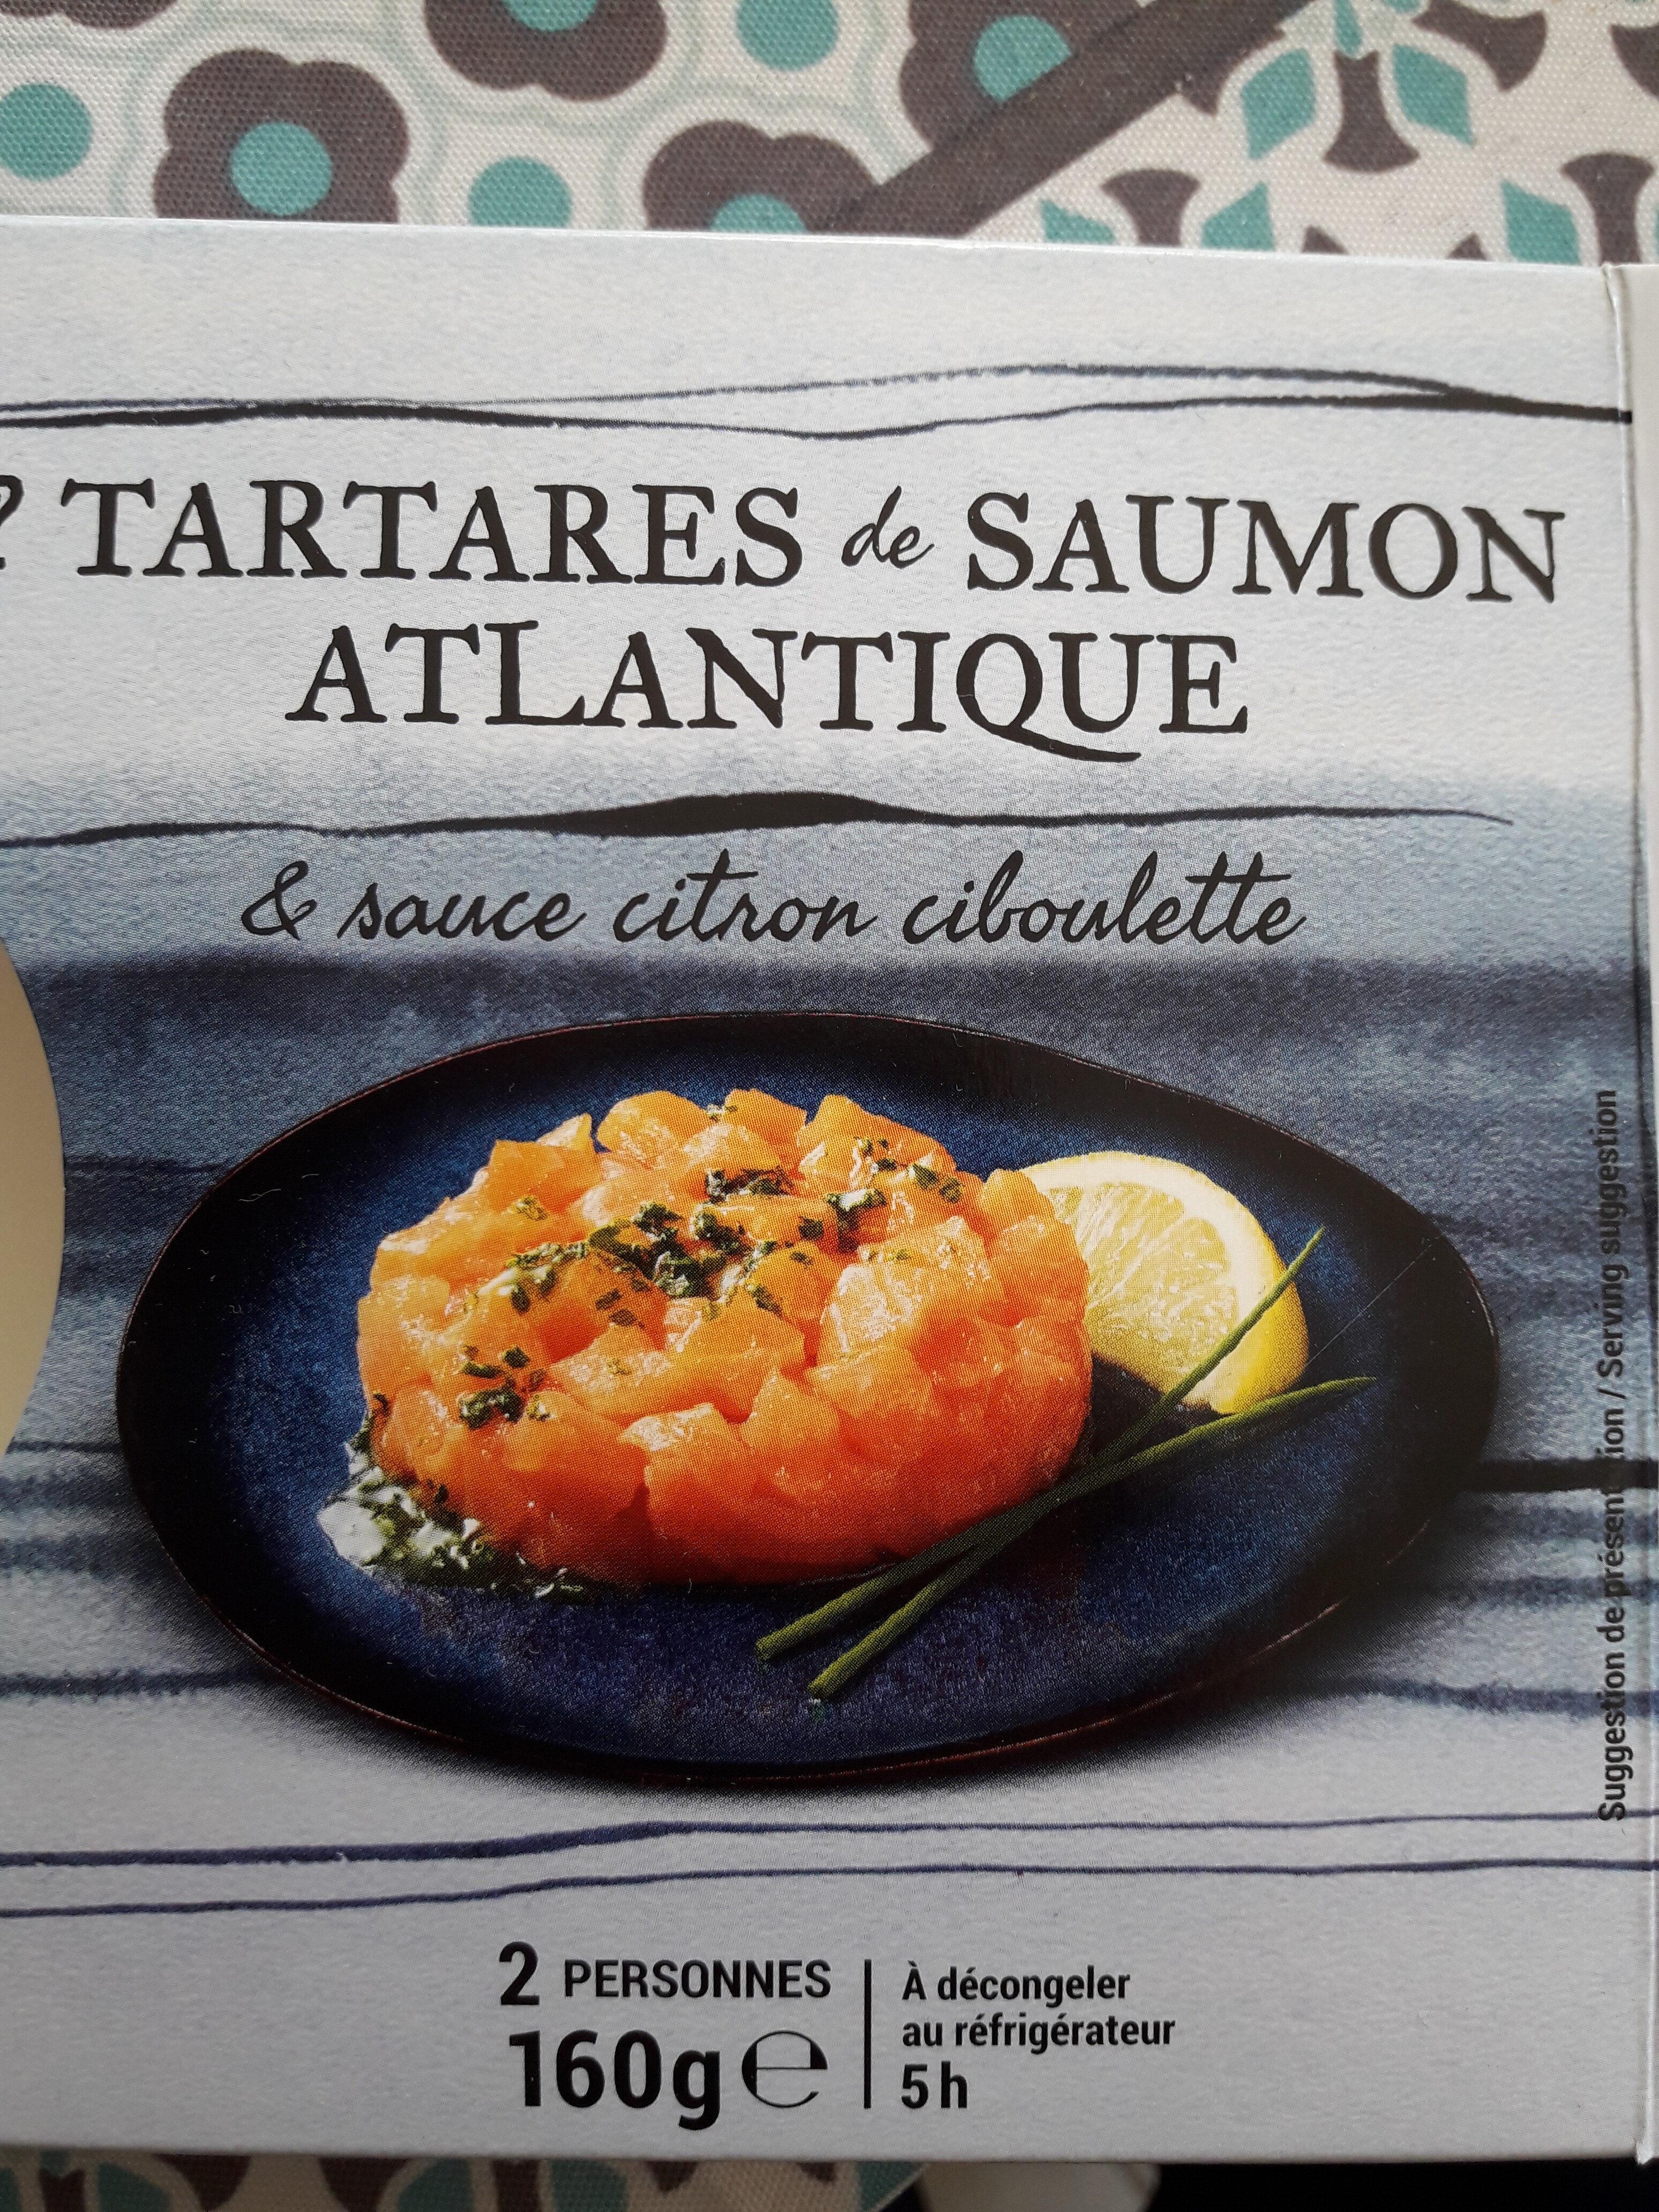 Tartare de saumon thiriet - Product - fr